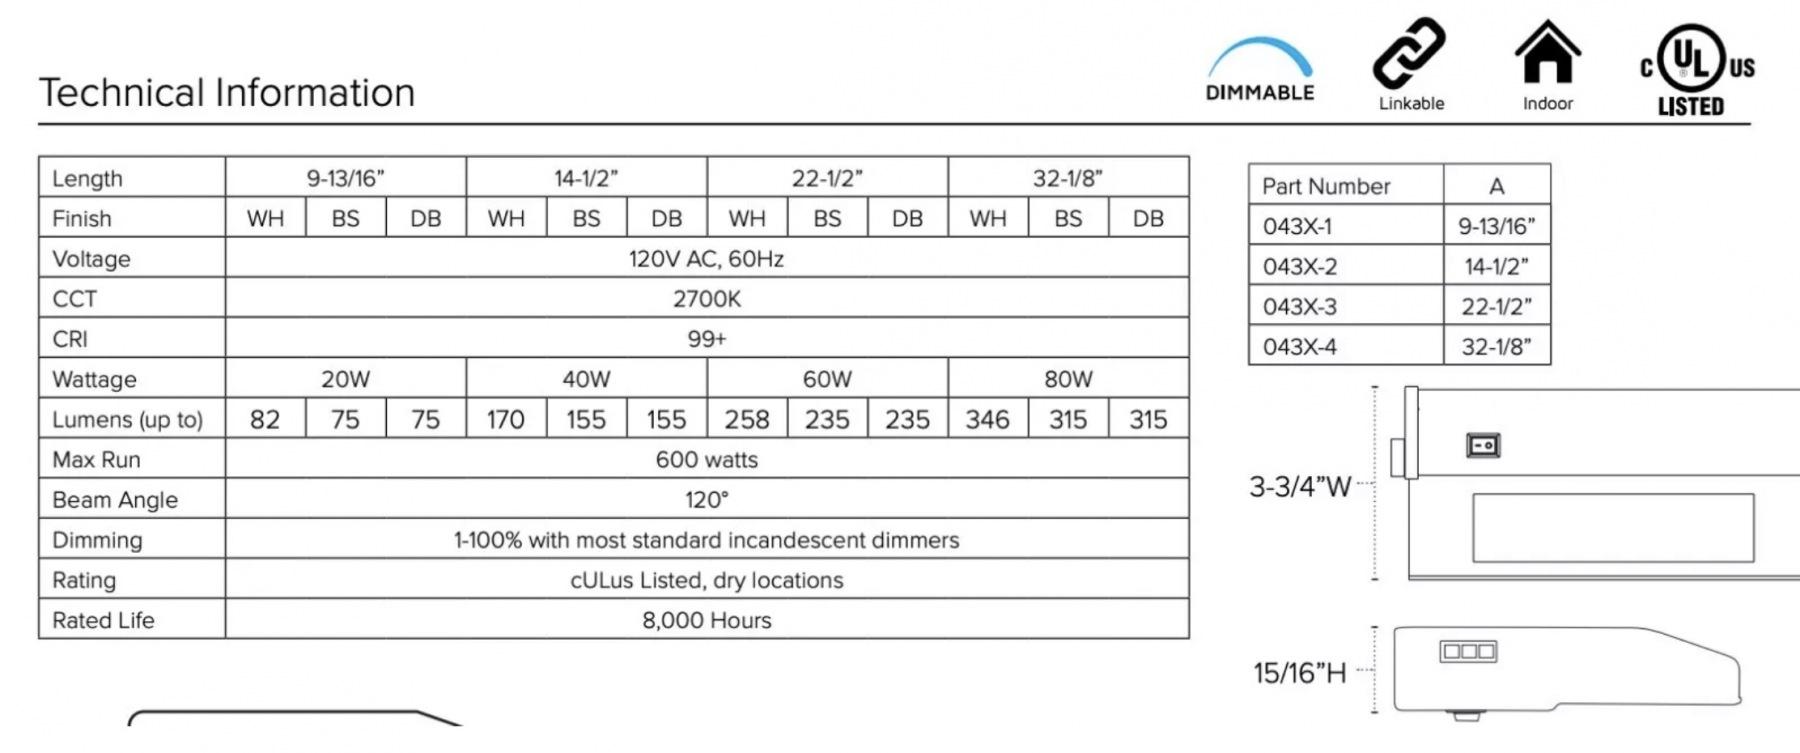 DDF20CF2-4FE6-4348-9C5E-B6C69D4E845C.jpeg.3fc1bd5113bd0184028886fa4c356fa3.jpeg